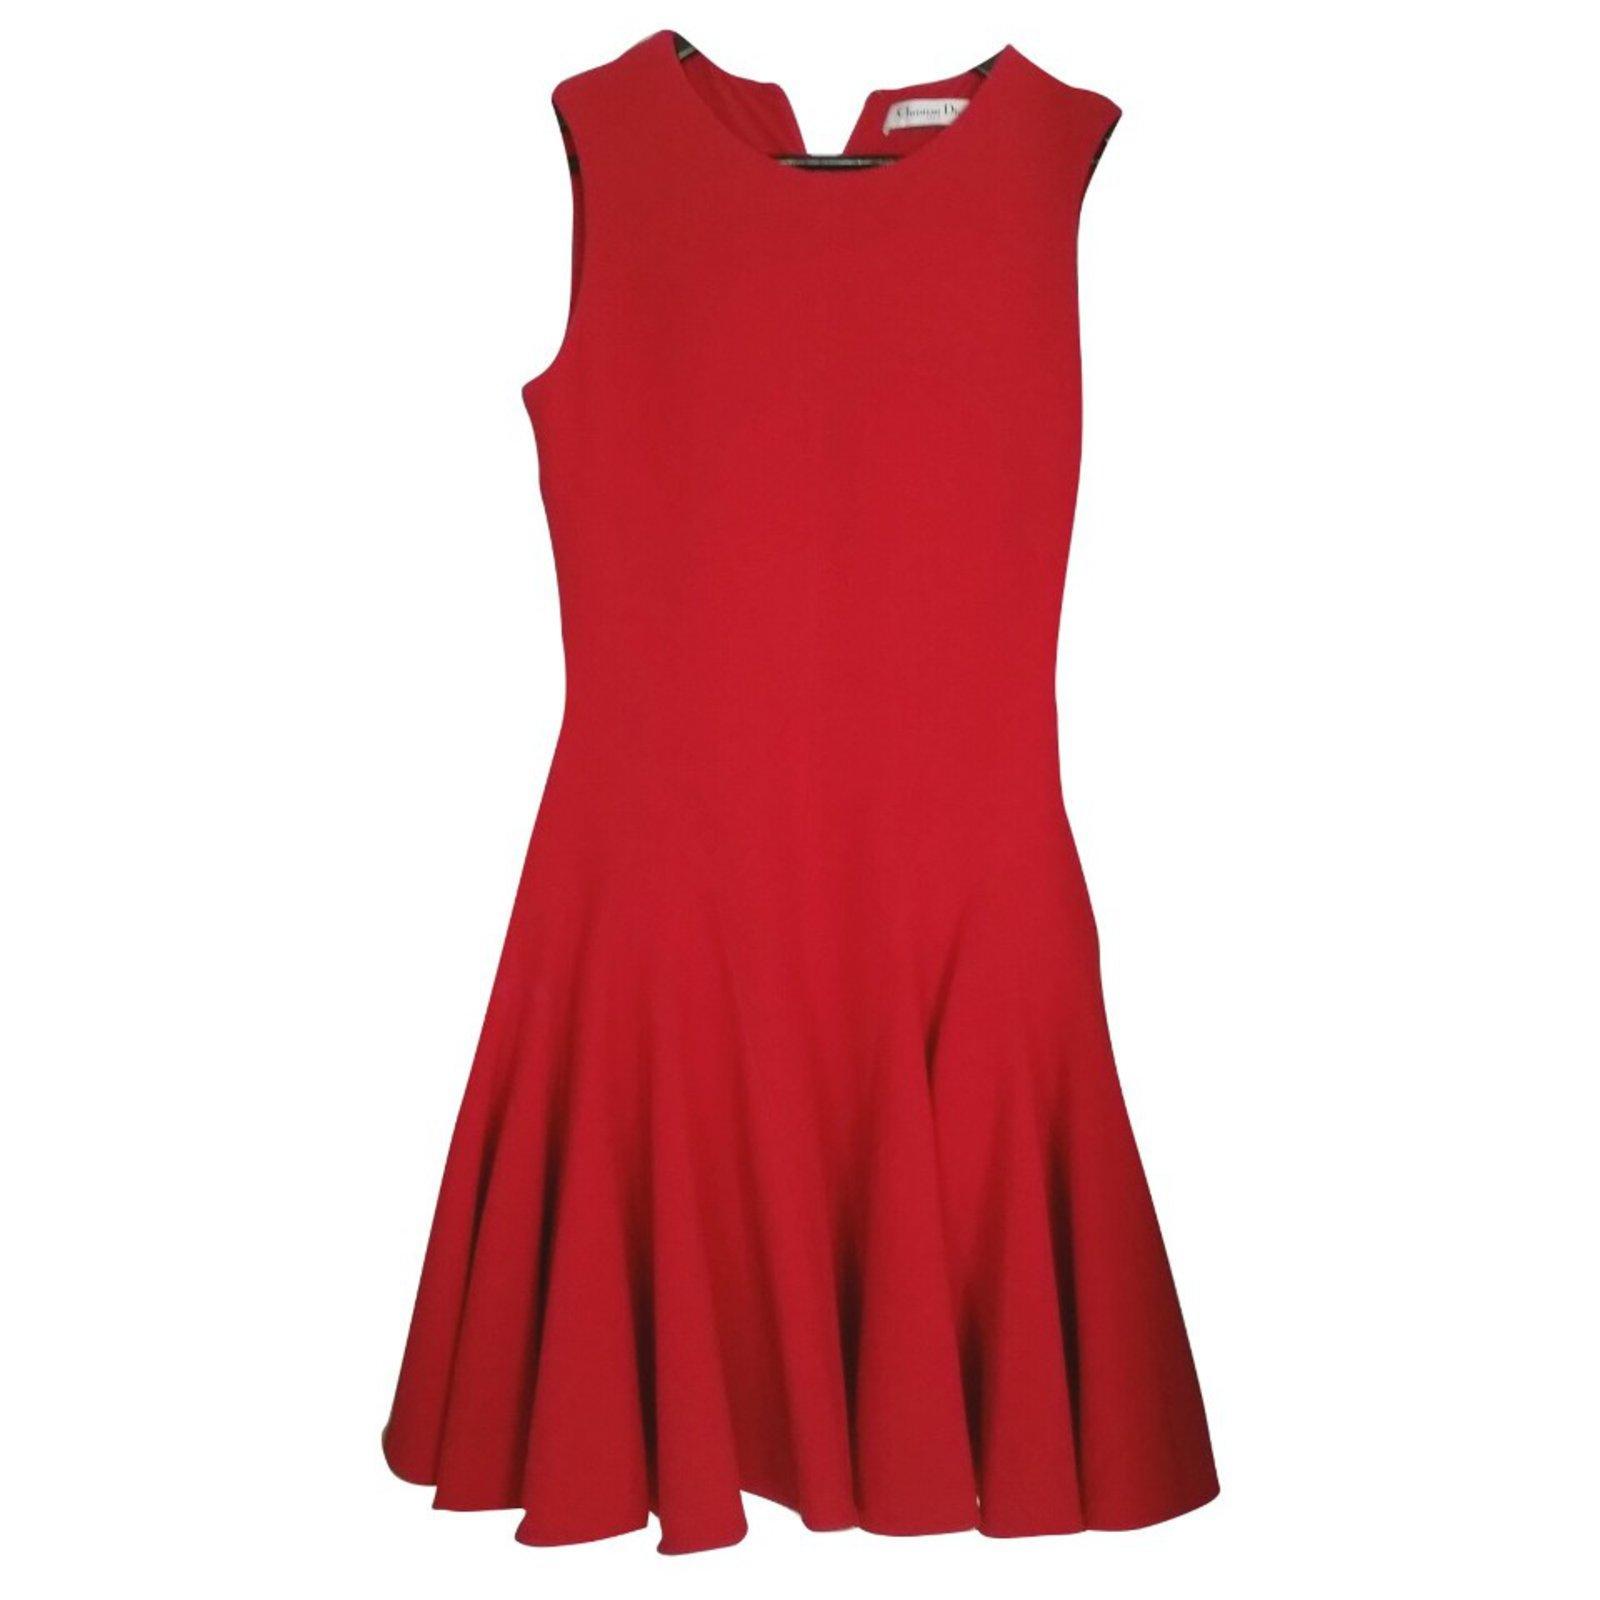 Dior Magnificent Signature Red Dress Dresses Wool Ref 50027